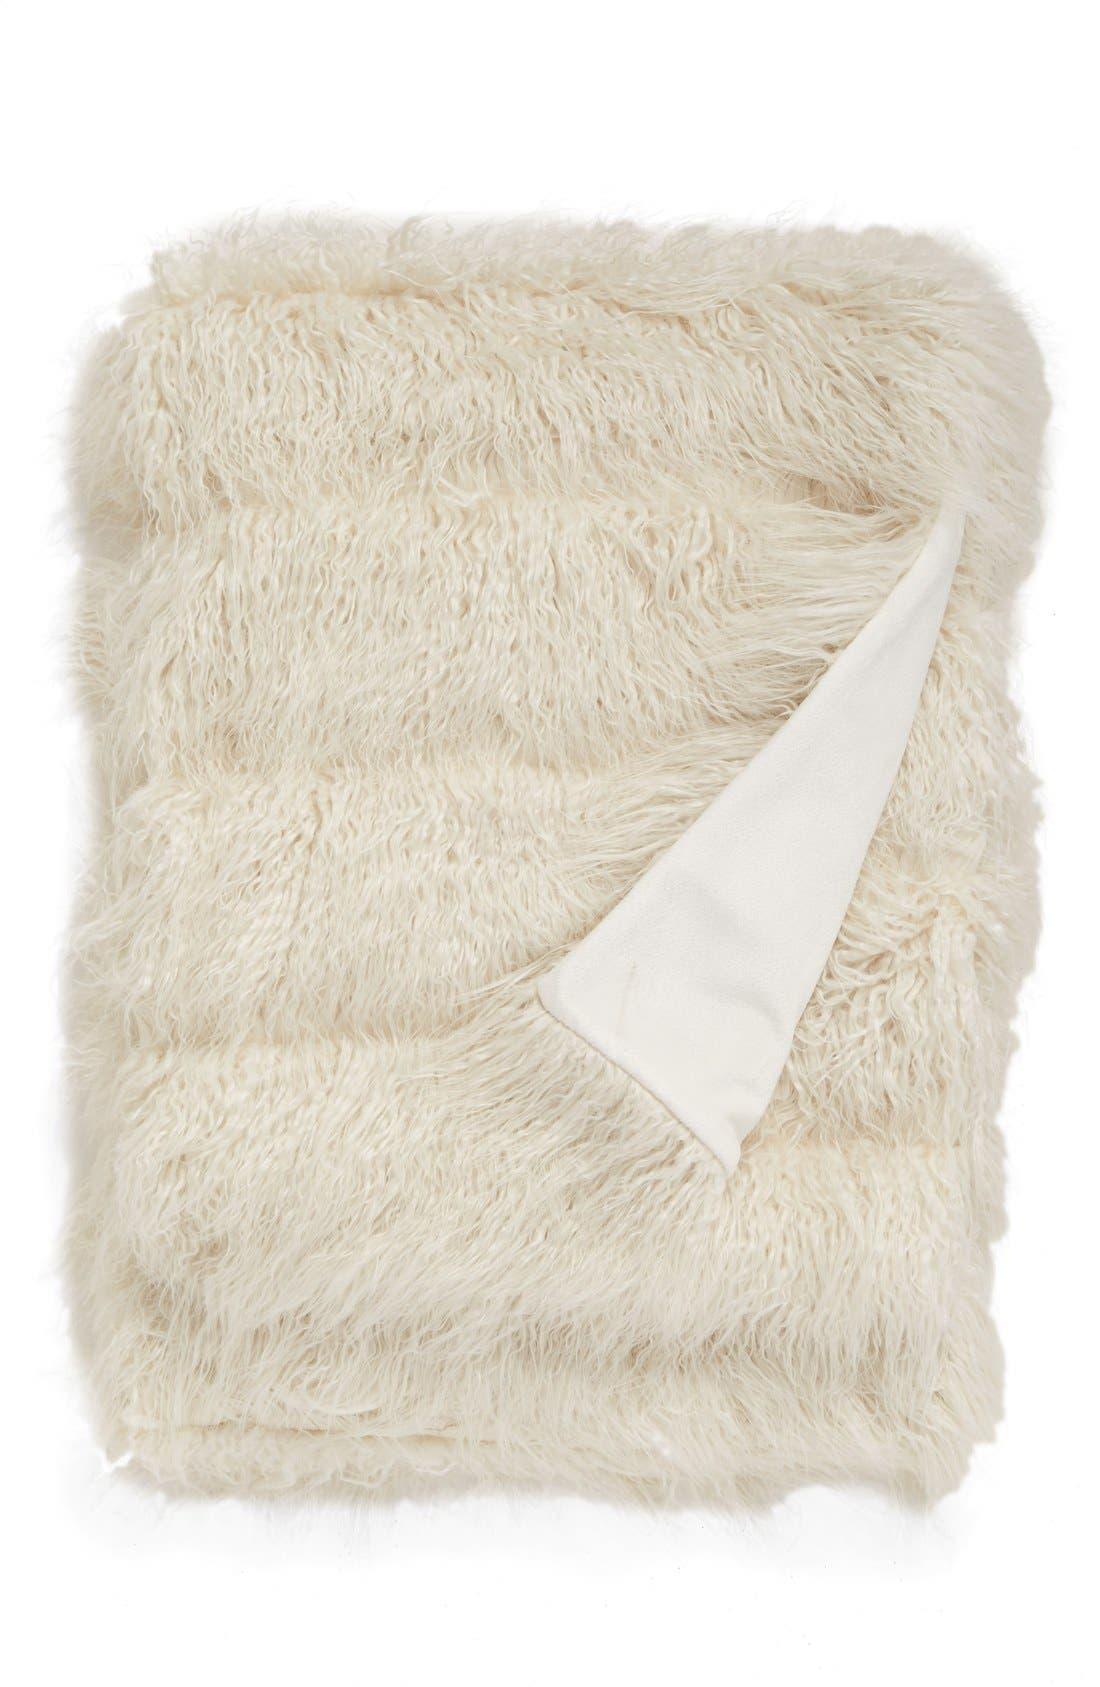 Mongolian Faux Fur Throw,                             Main thumbnail 1, color,                             Ivory